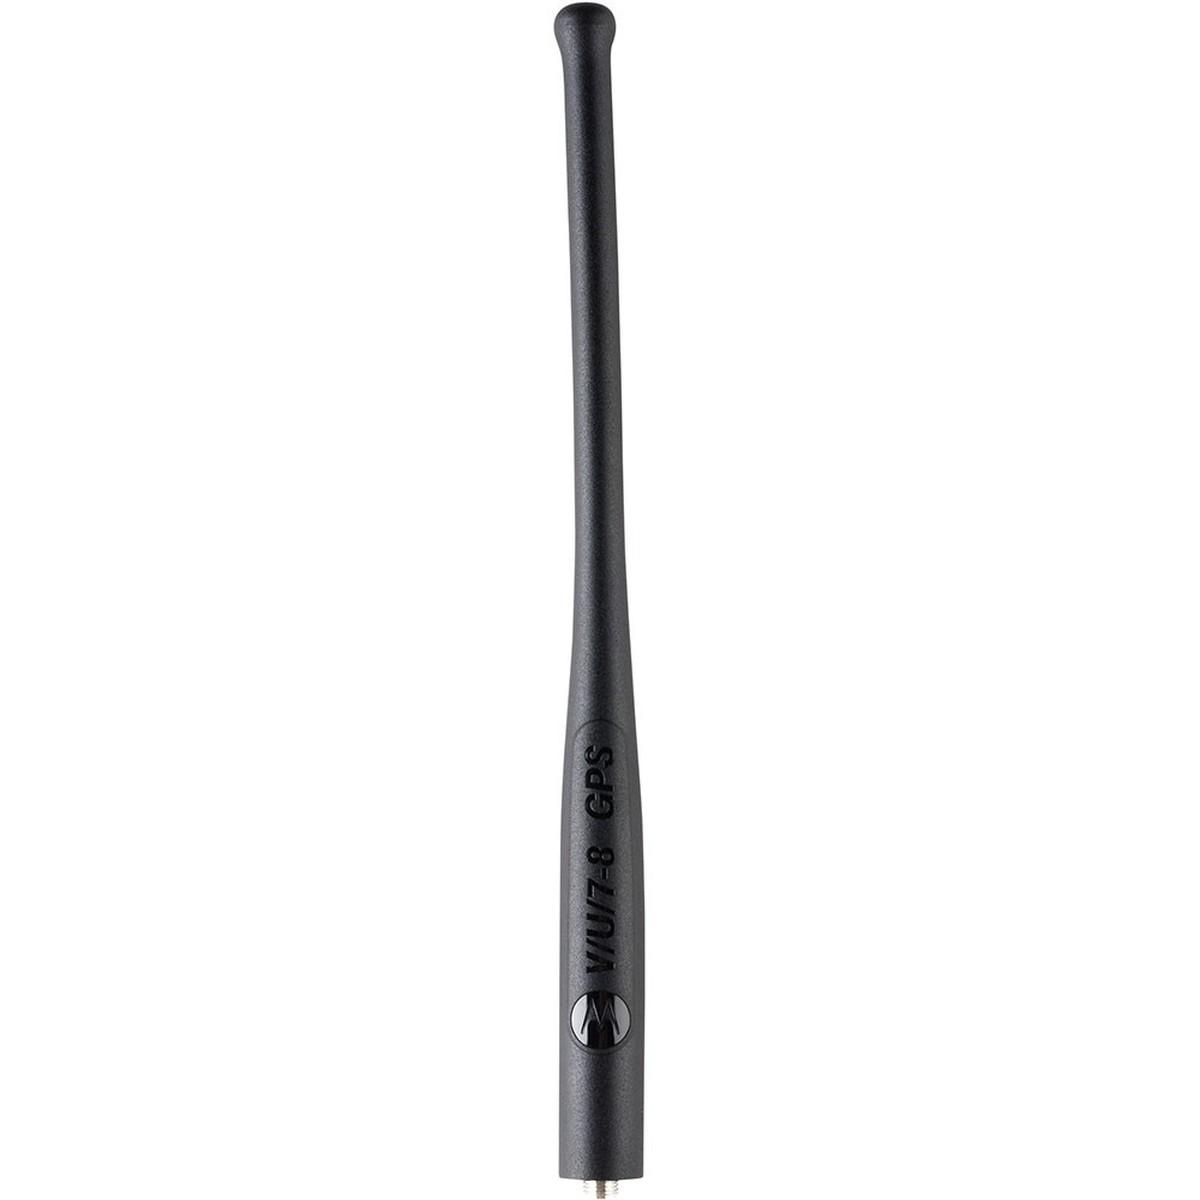 Antena Motorola para radio APX 8000 UHF-VHF 7-800 GPS MHz tipo látigo KT000026A01